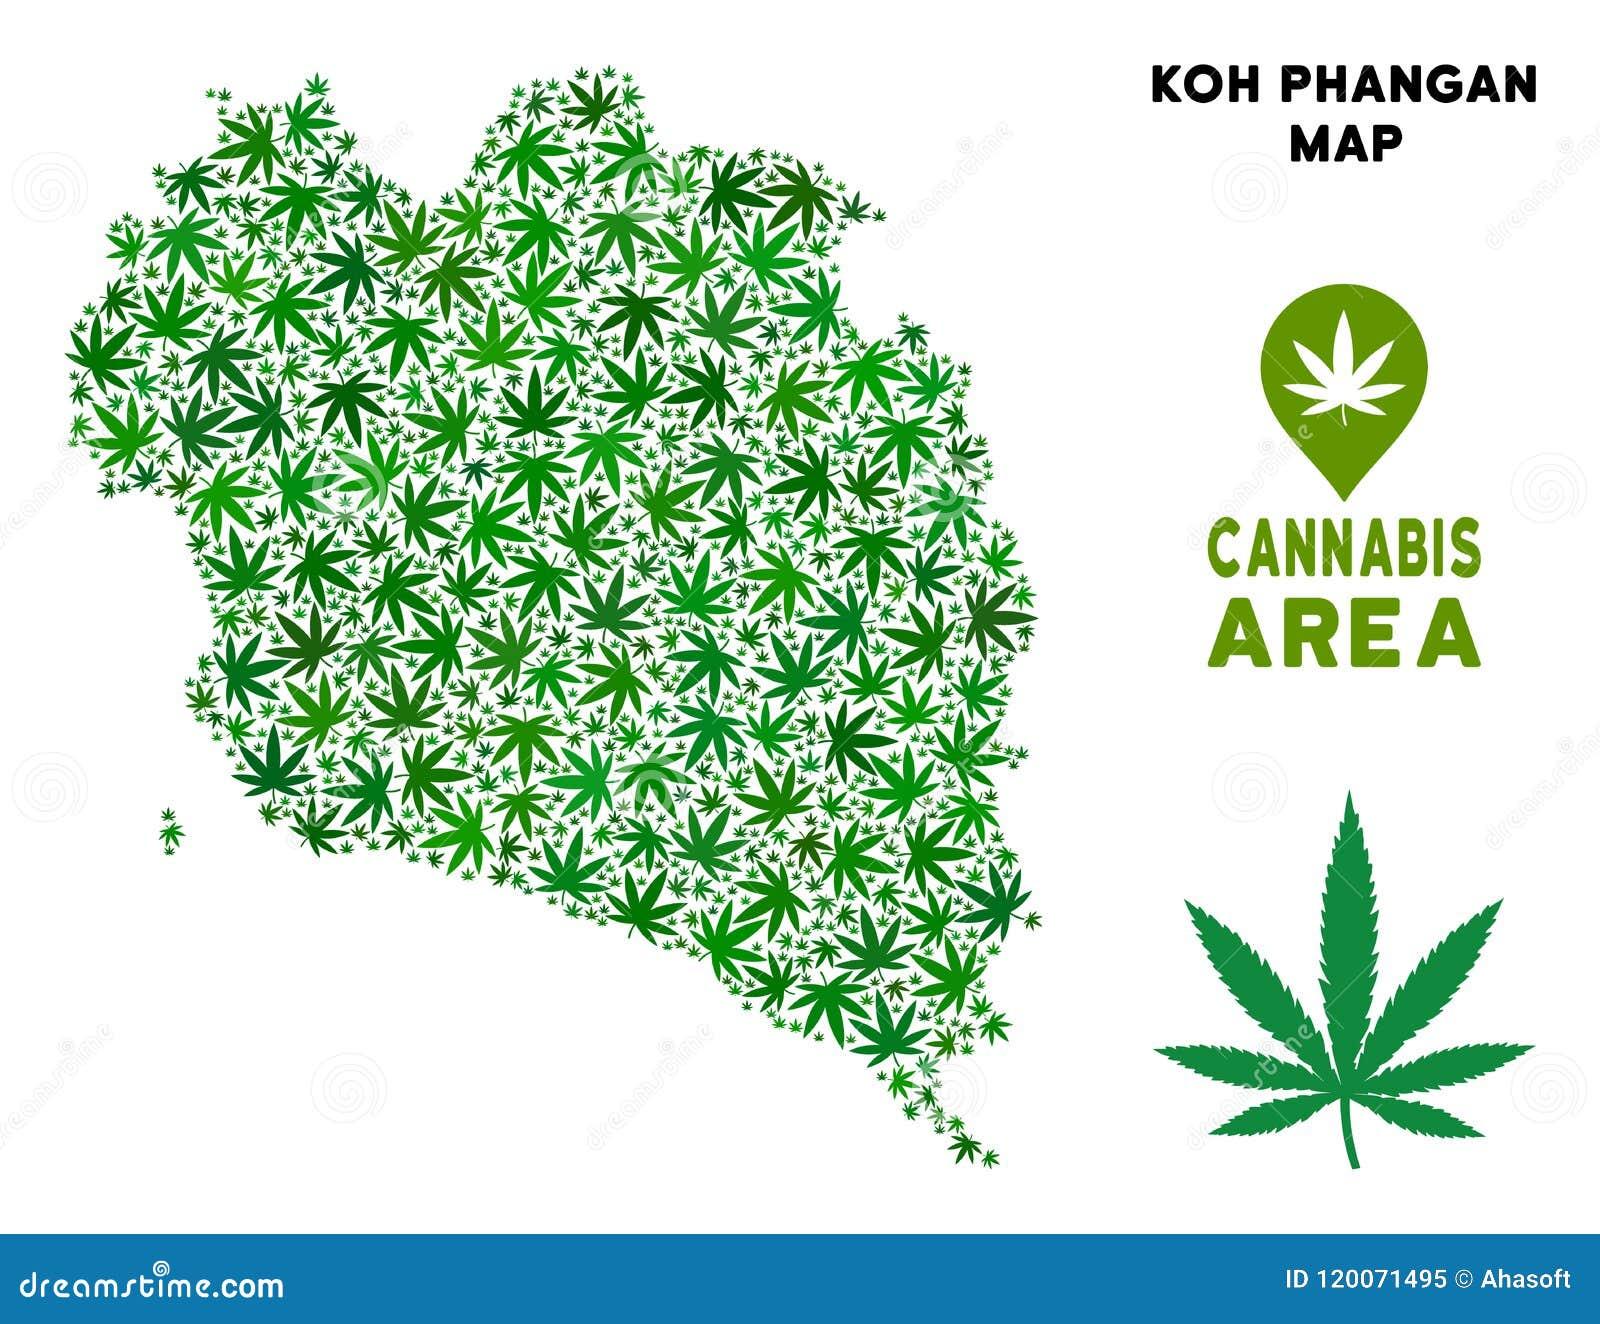 Koh Phangan Thailand Map.Vector Marijuana Composition Koh Phangan Thai Island Map Stock